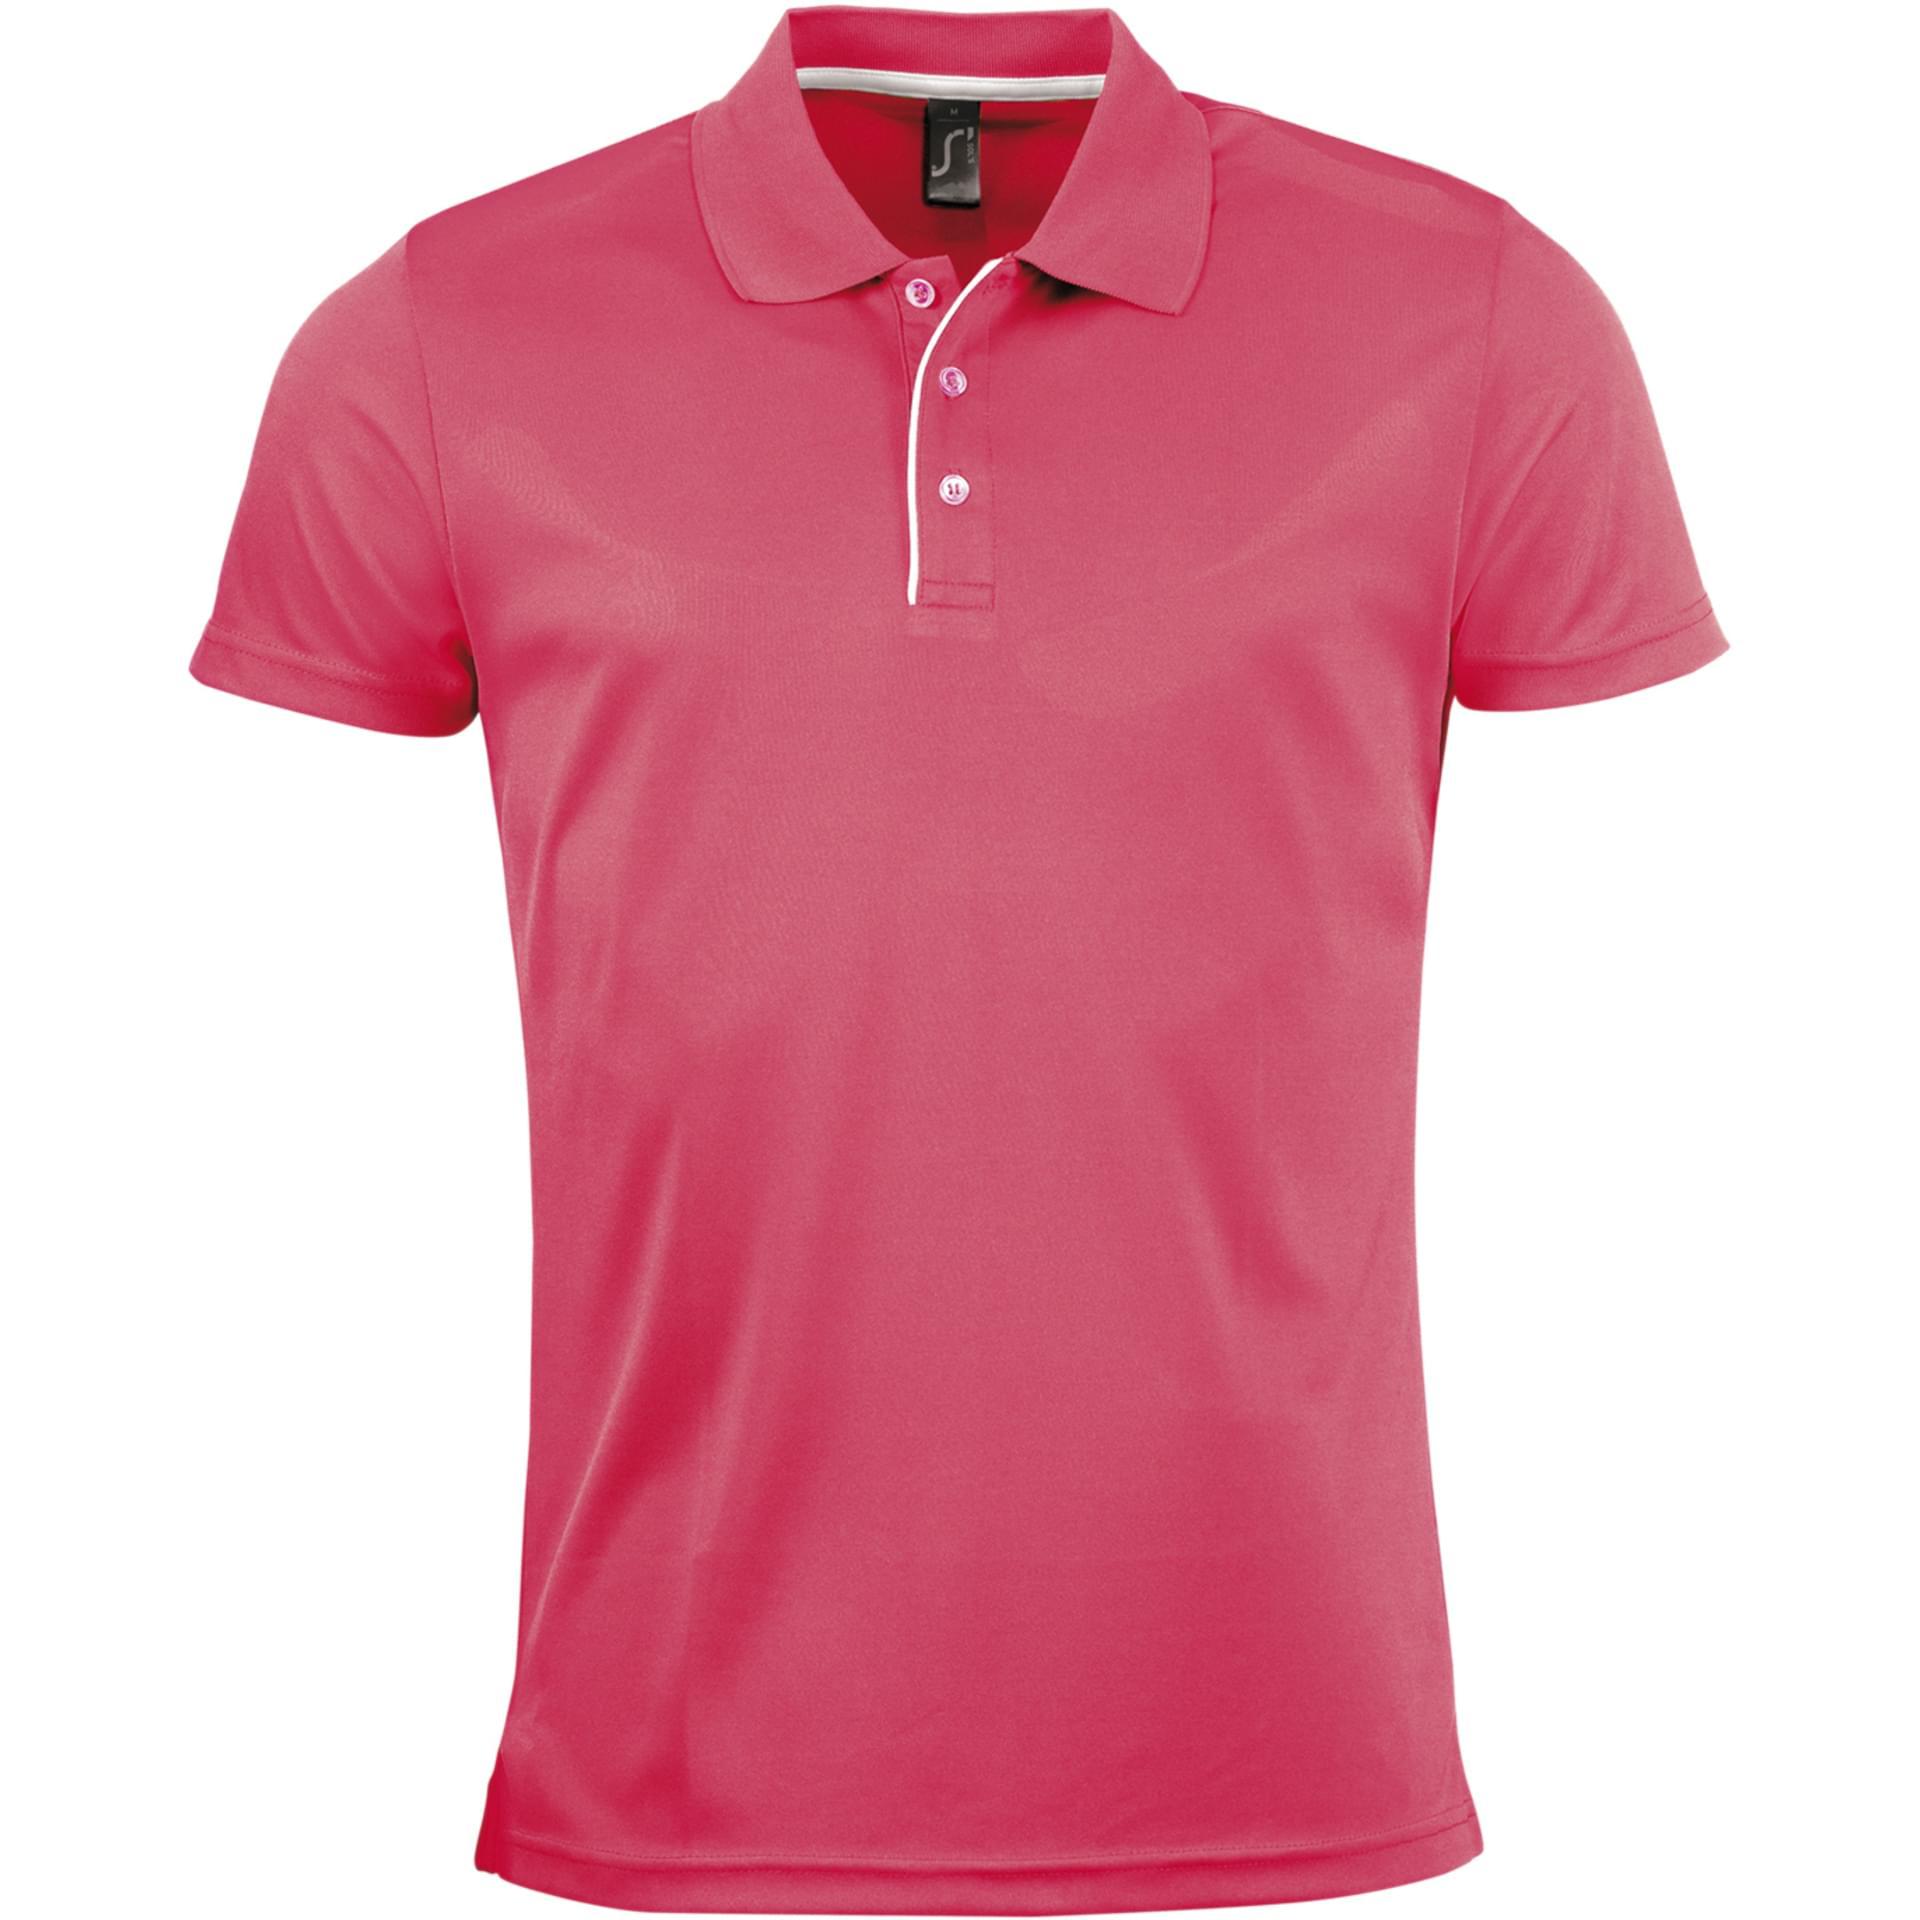 T-shirt de style polo corail